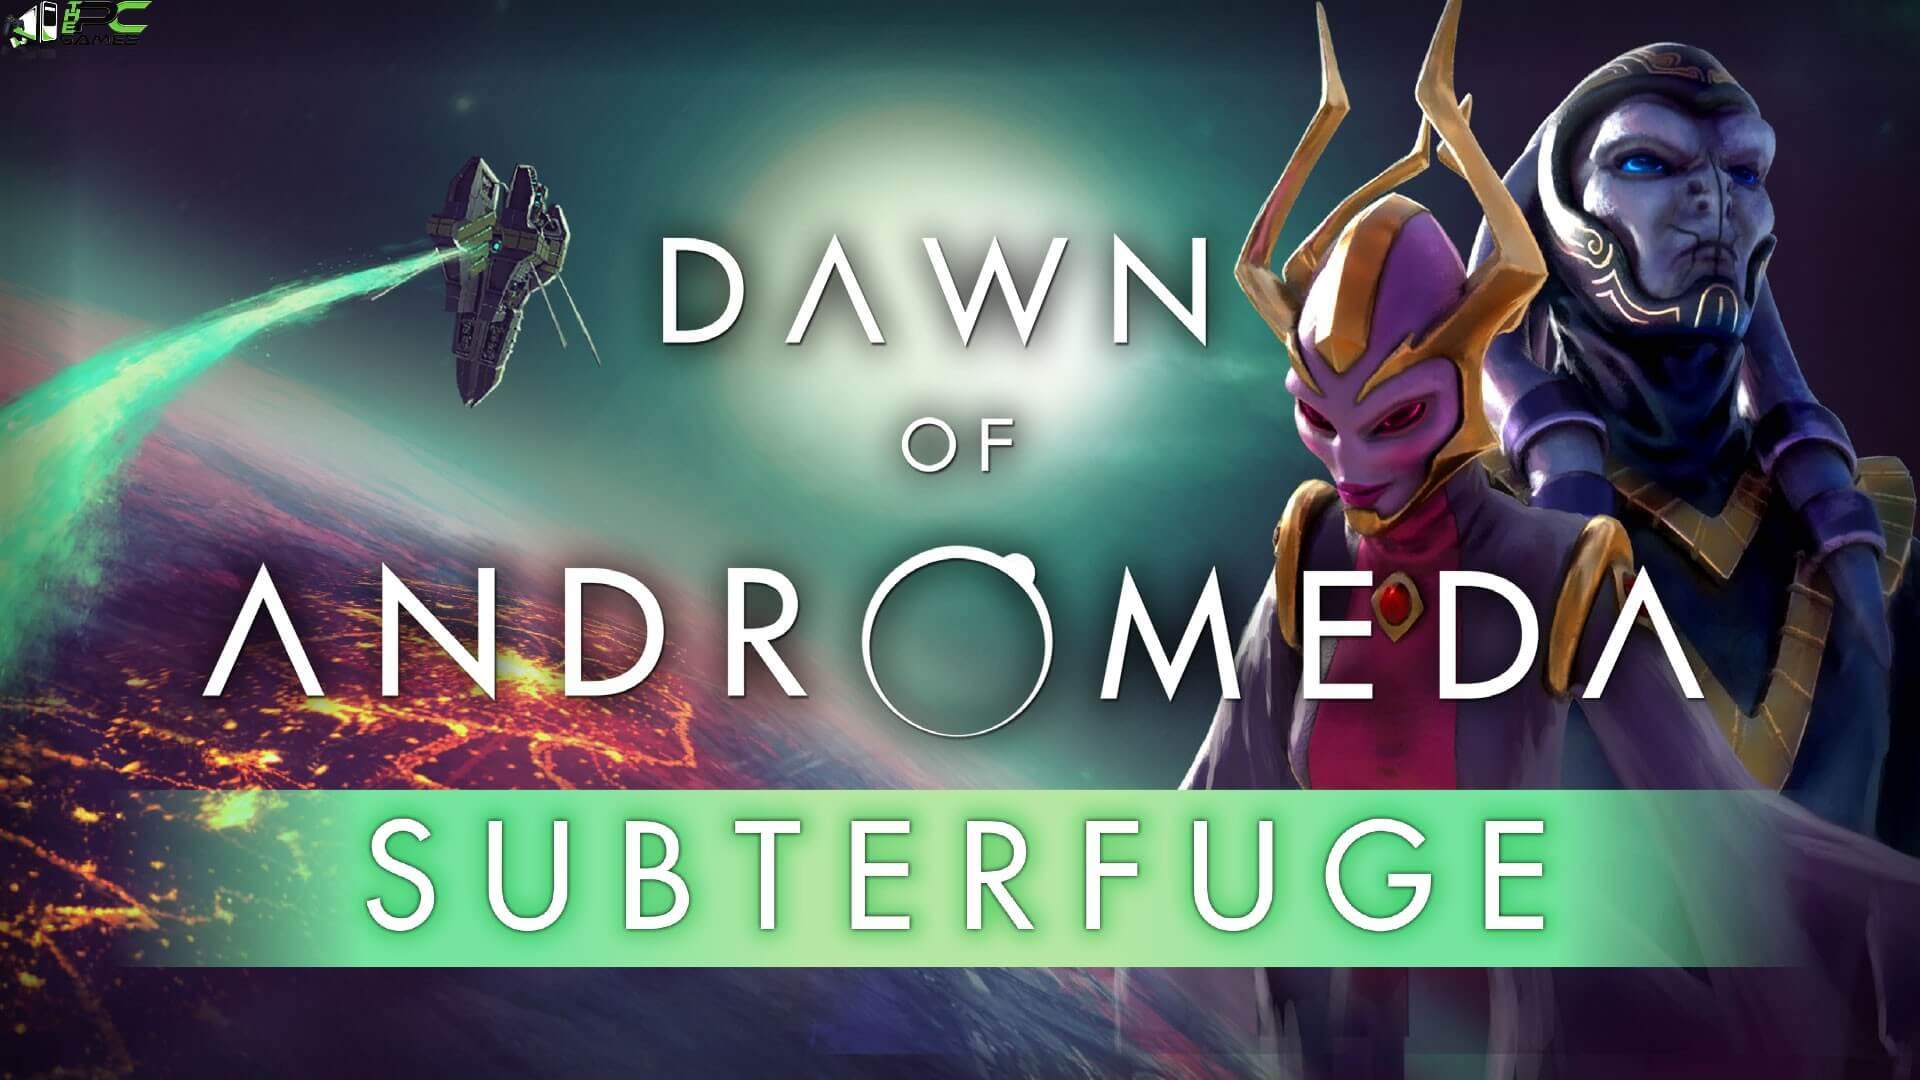 Dawn of Andromeda SubterfugeFree Download